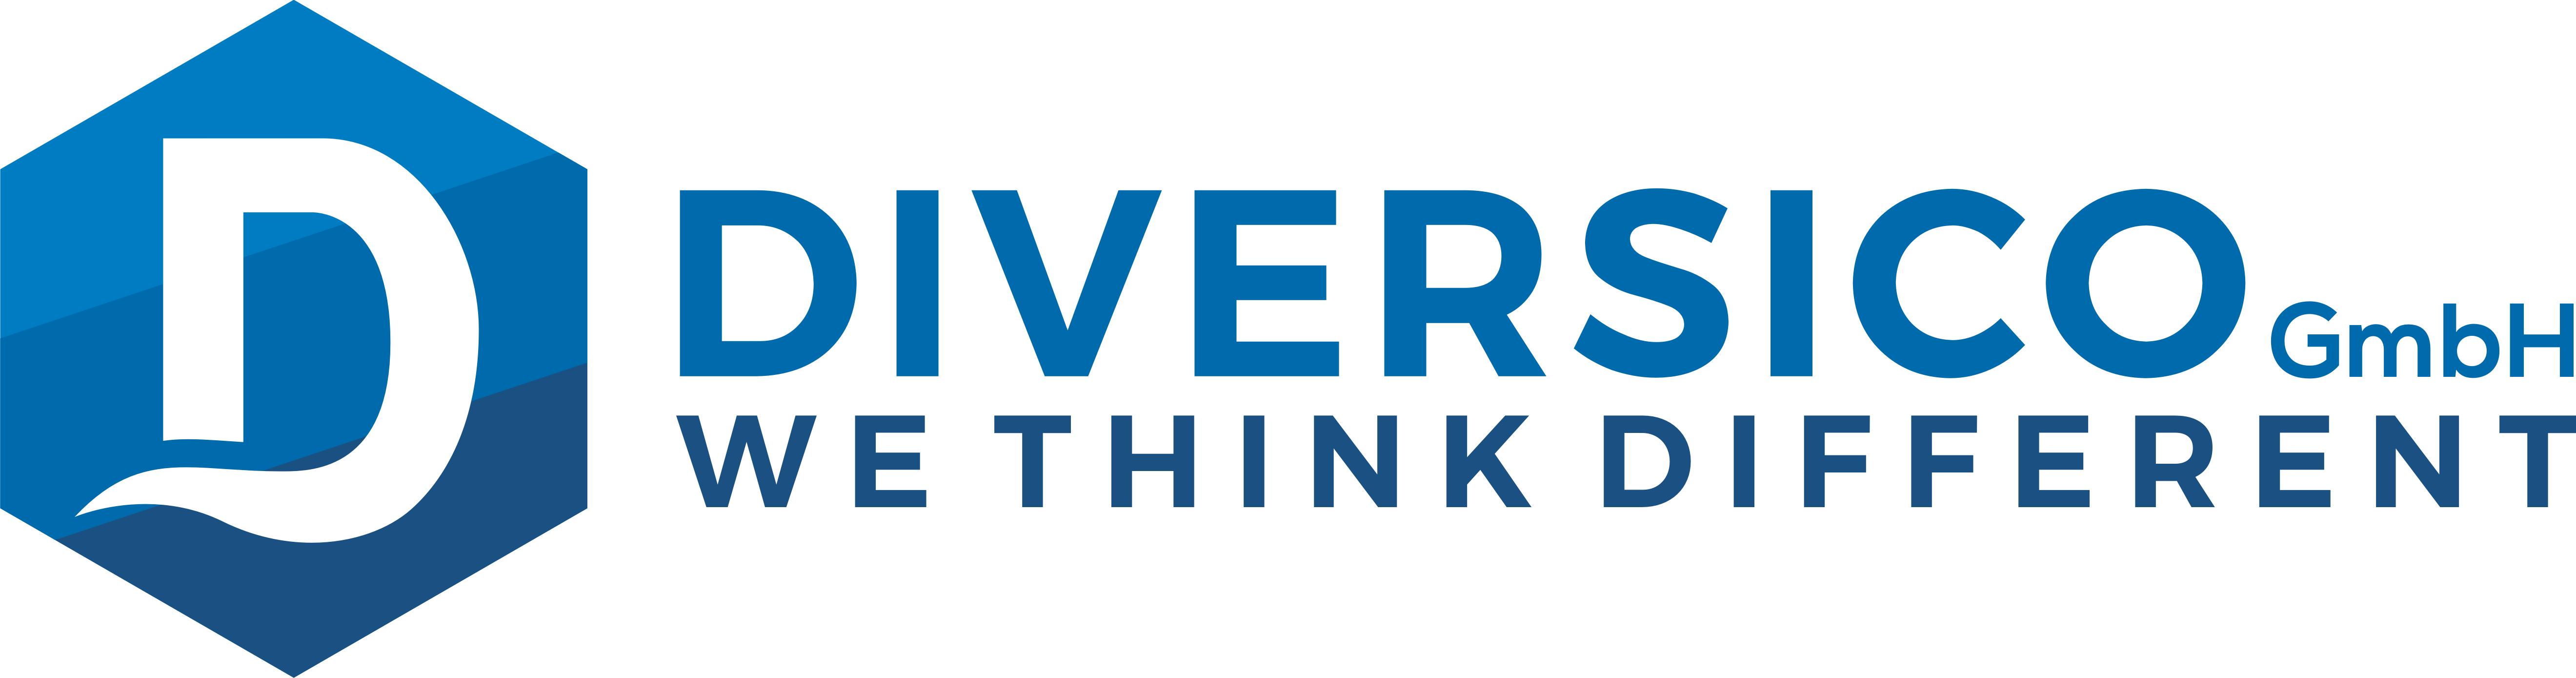 Diversico GmbH